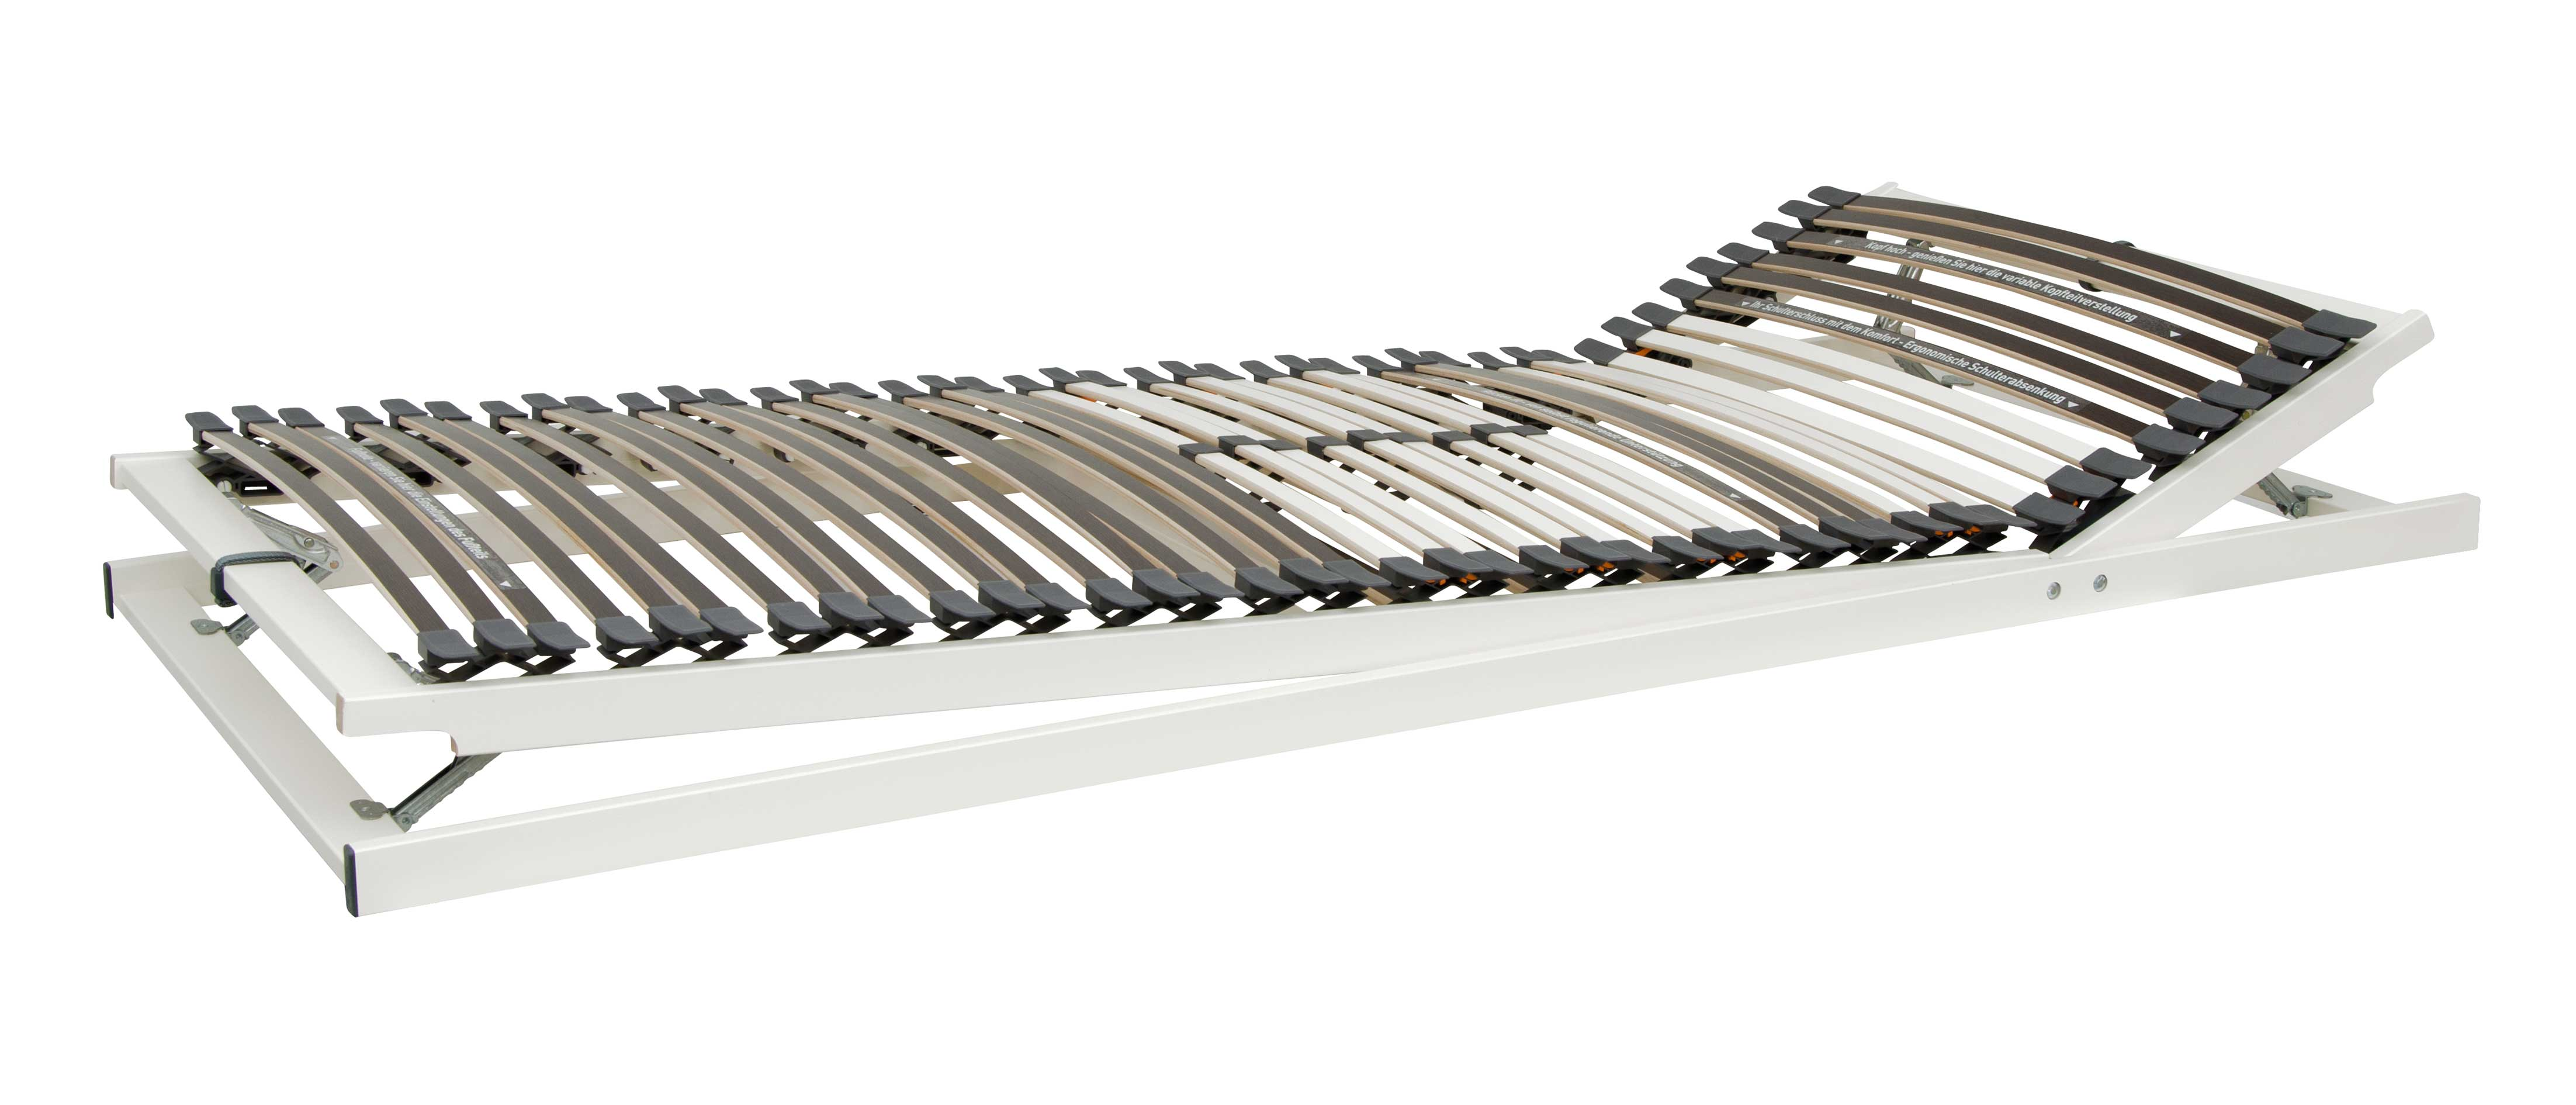 softsleep lattenroste trioflex lattenrost motor lattenrost elektrisch. Black Bedroom Furniture Sets. Home Design Ideas